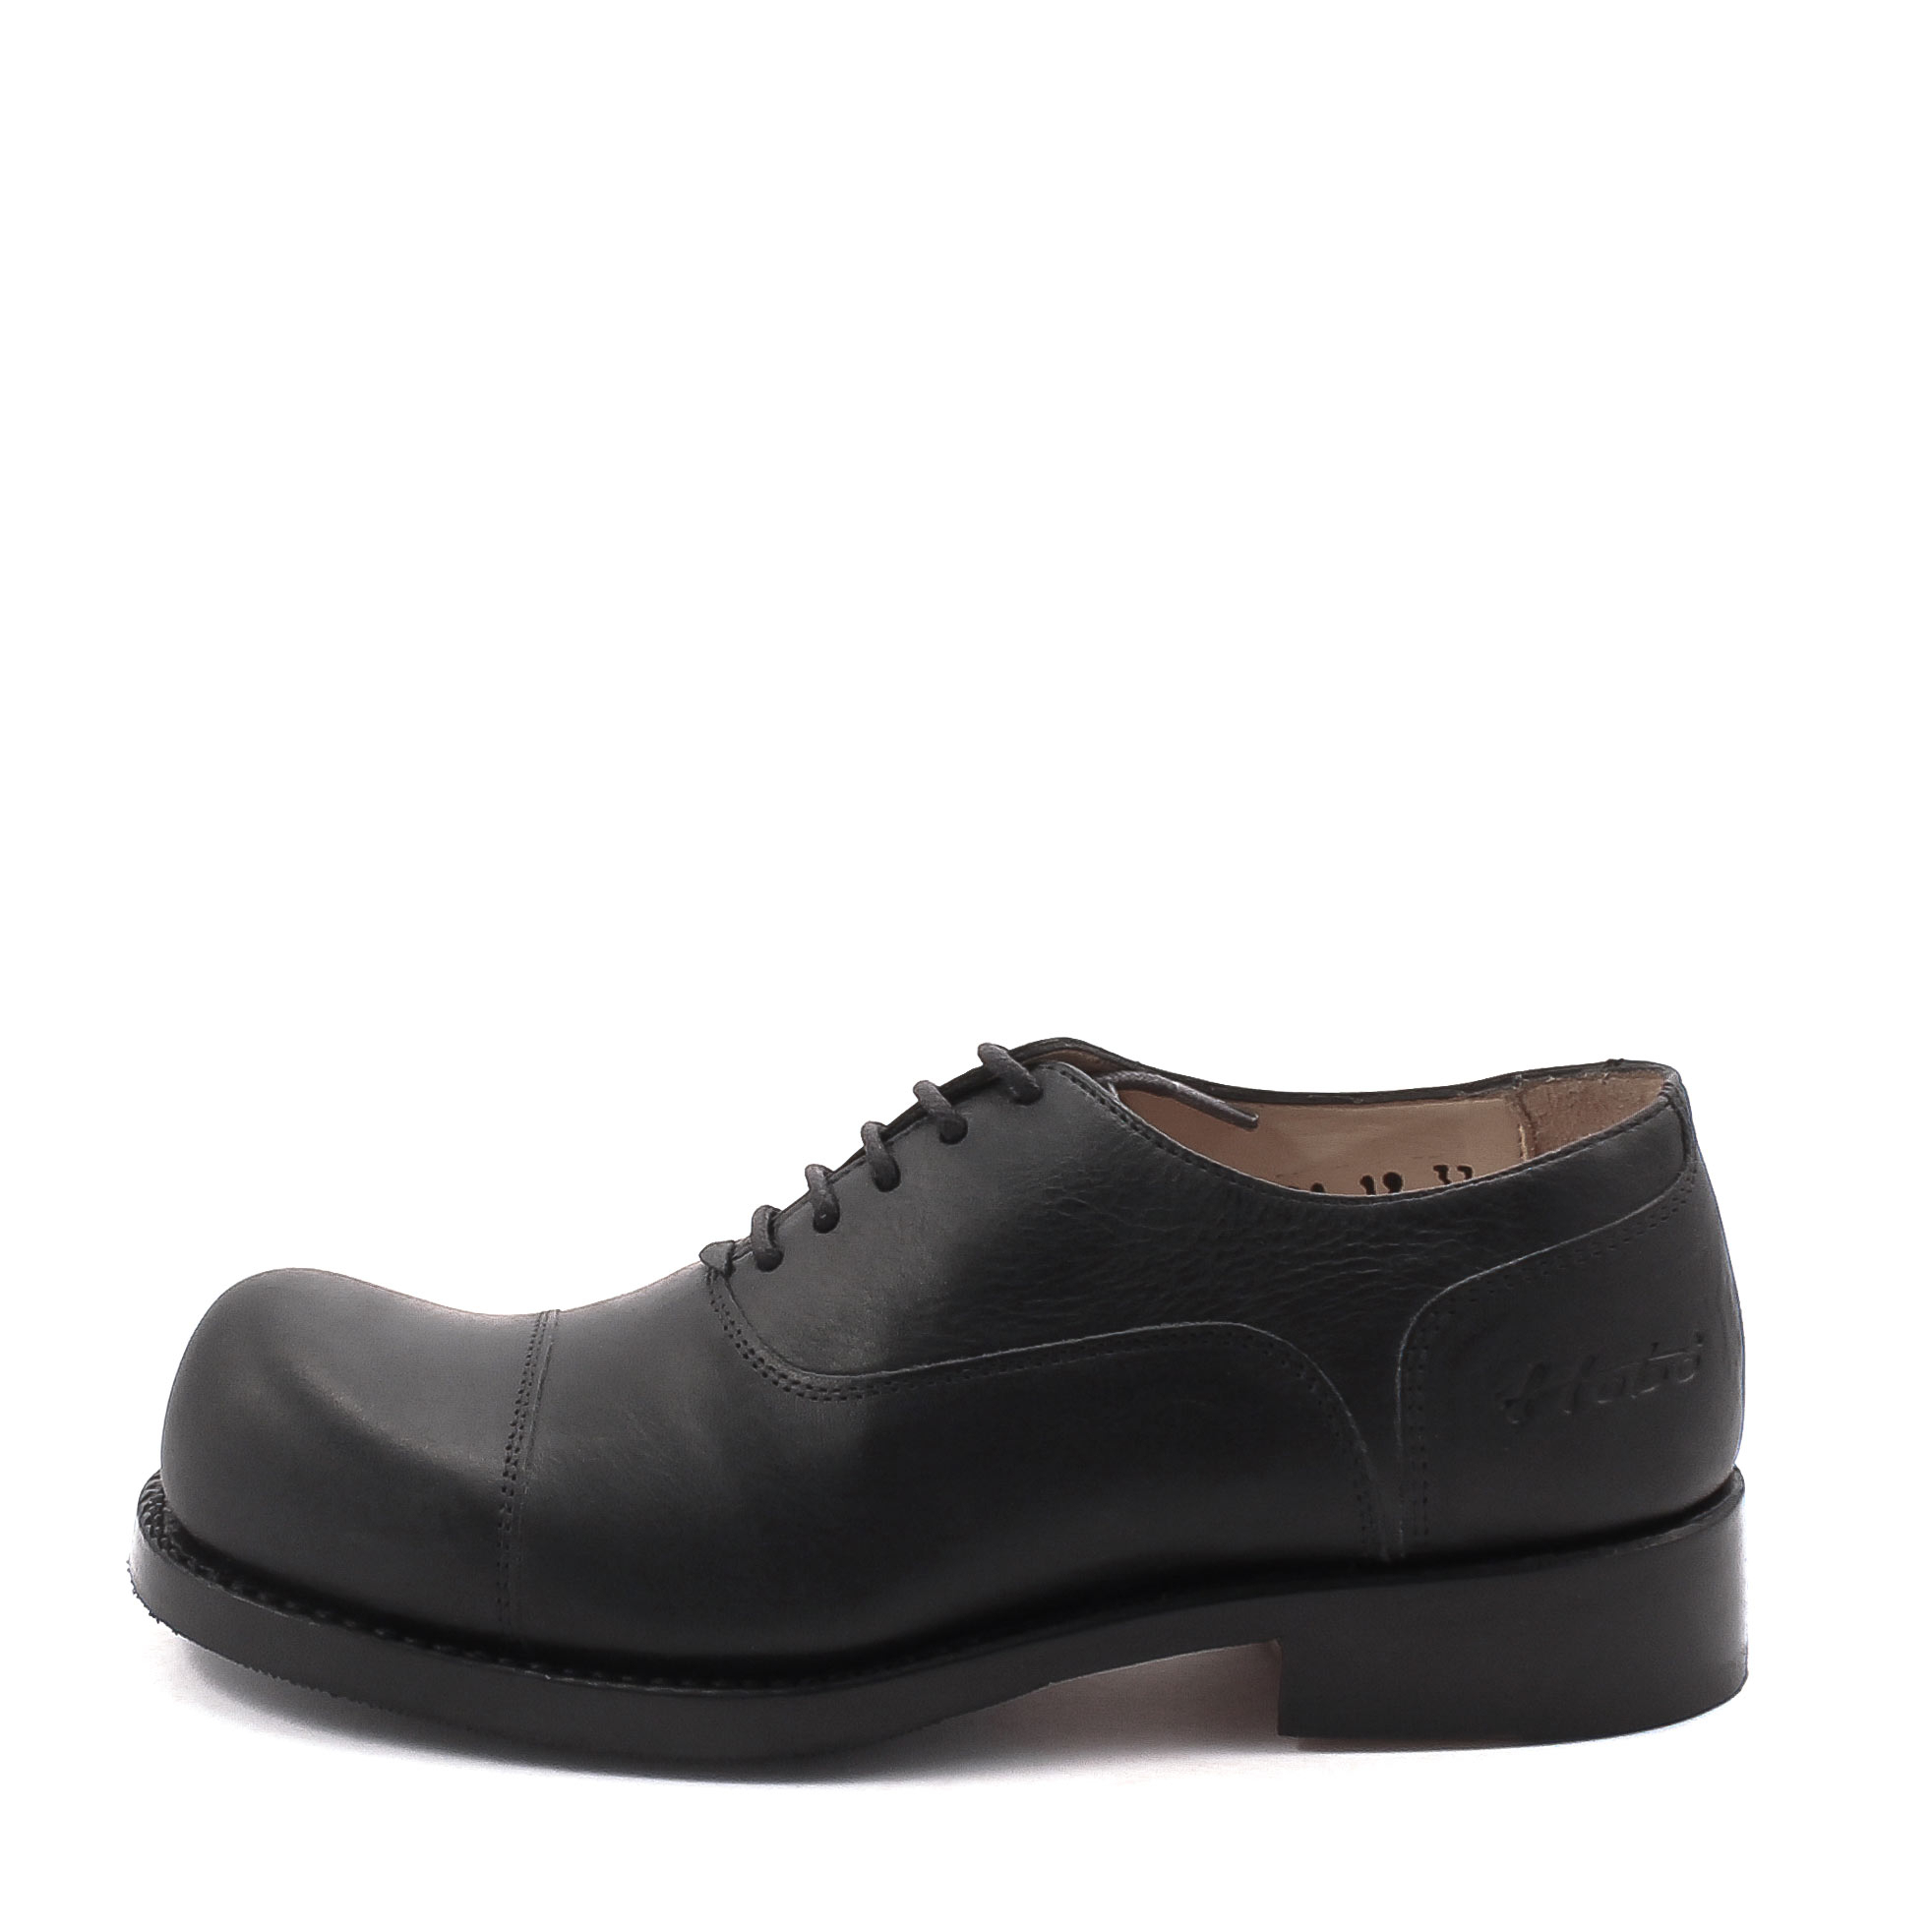 HOBO, Charly f Women's Lace-up Shoes, black Größe 36